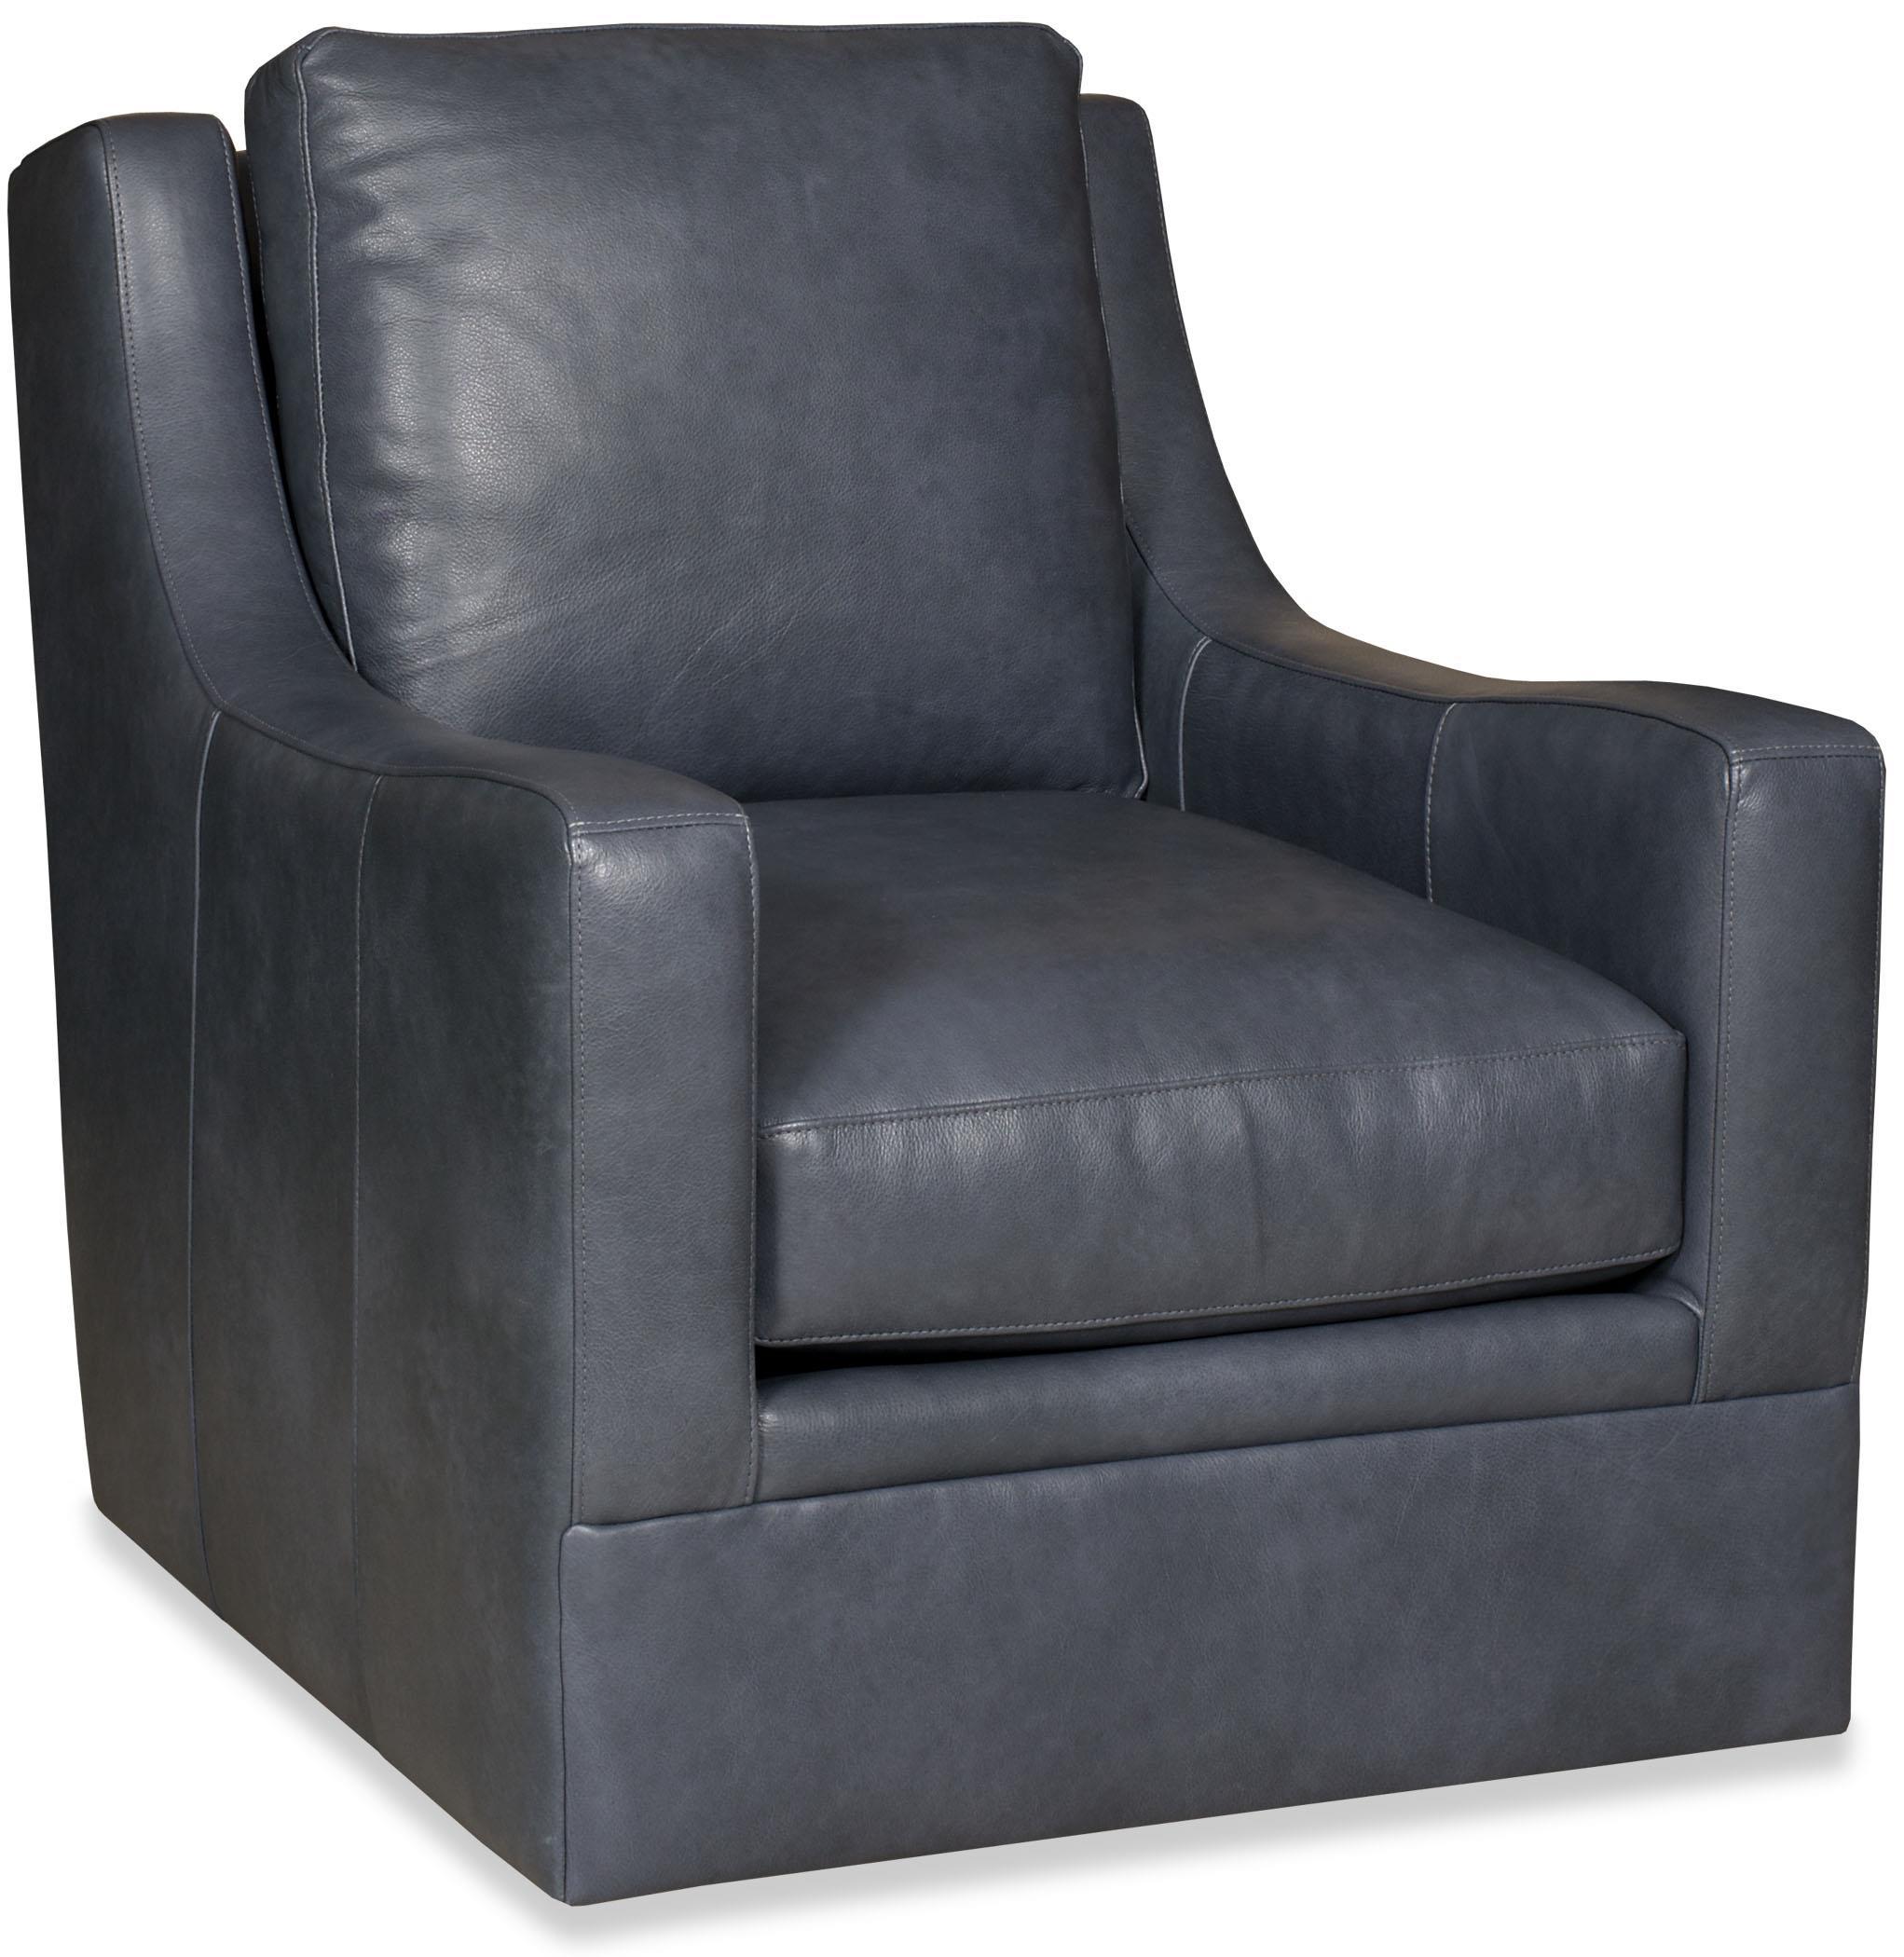 Bradington Young Swivel Tub Chairs Jagger Swivel Tub Chair